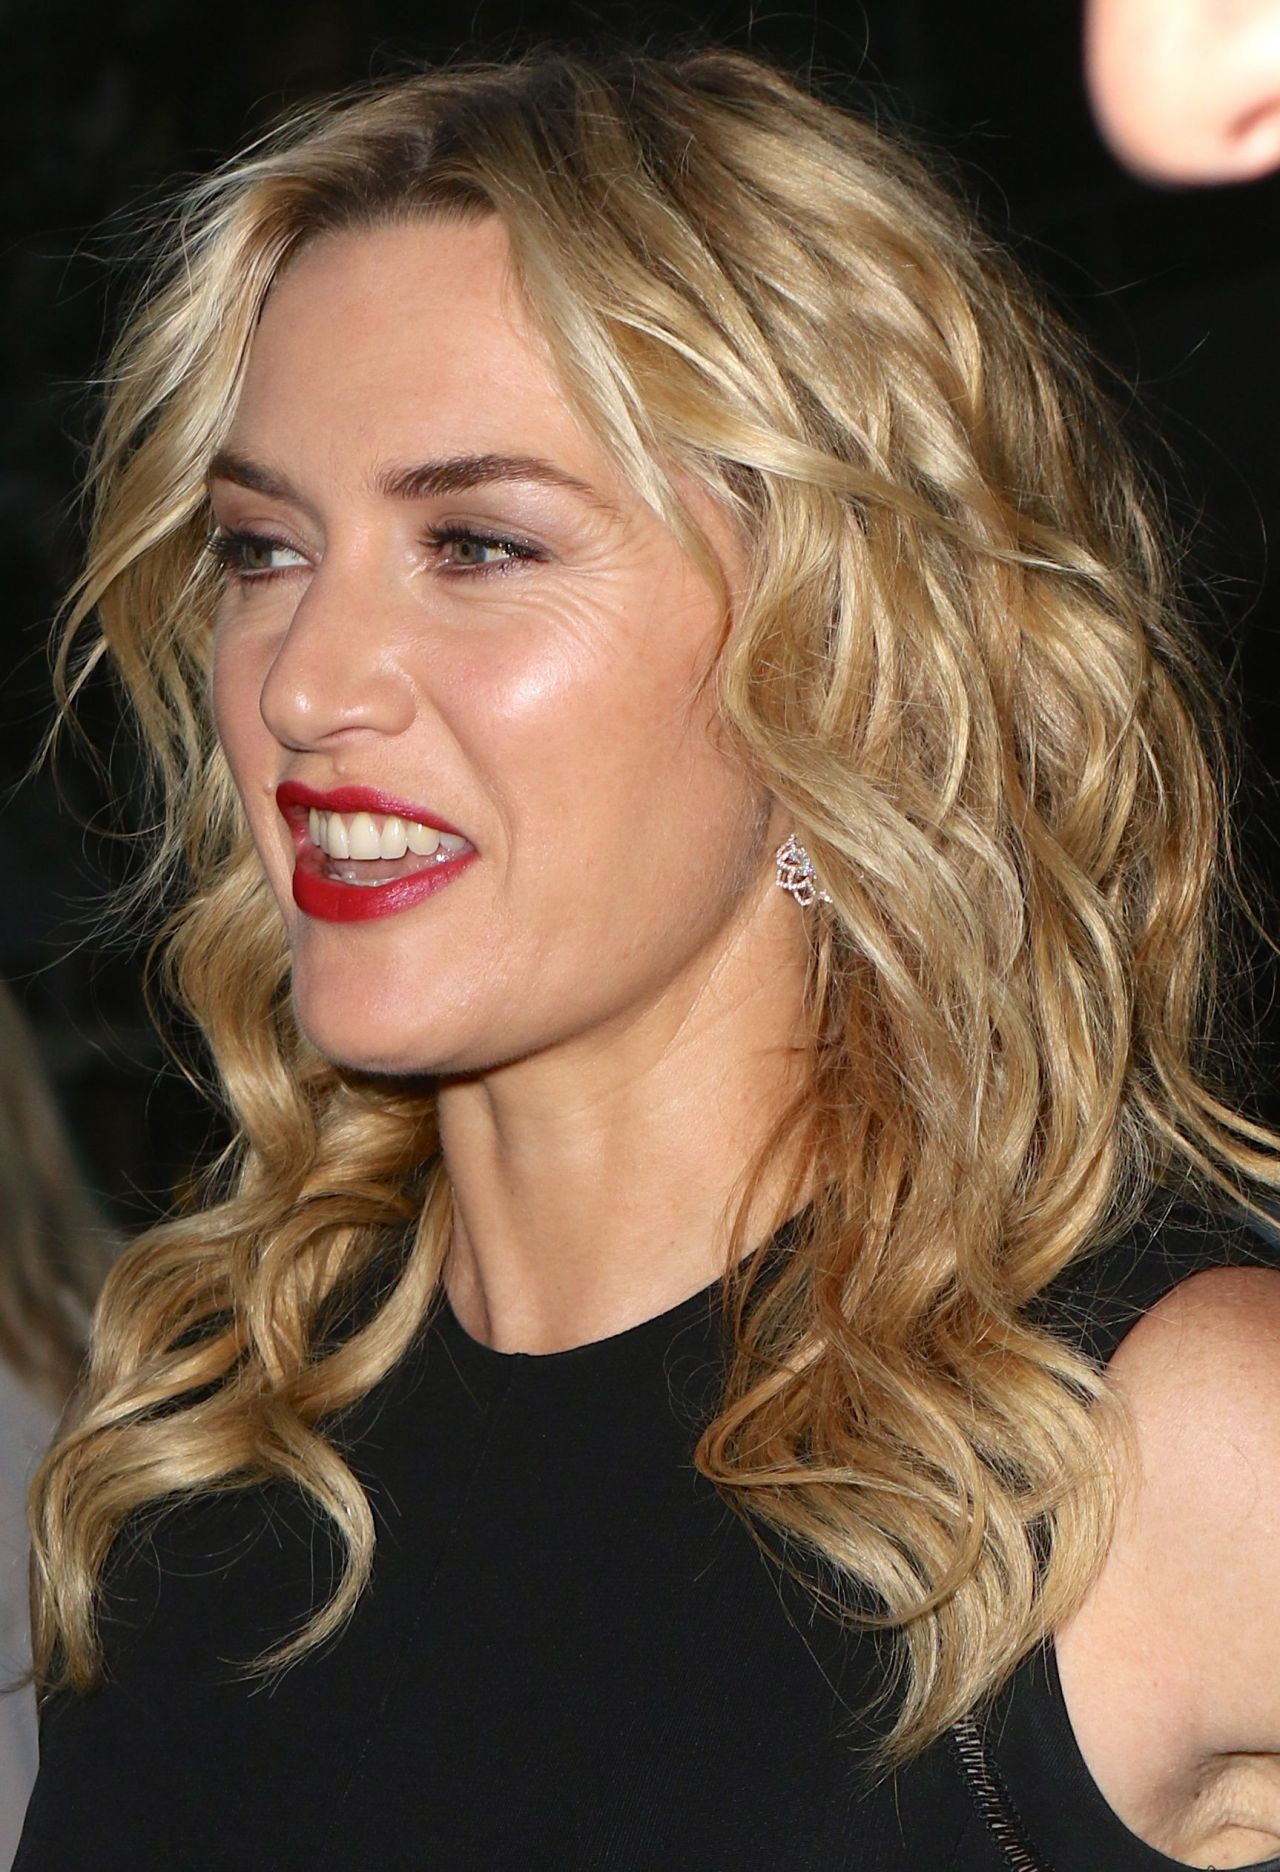 Kate Winslet The Dressmaker Premiere In New York 9 16 2016